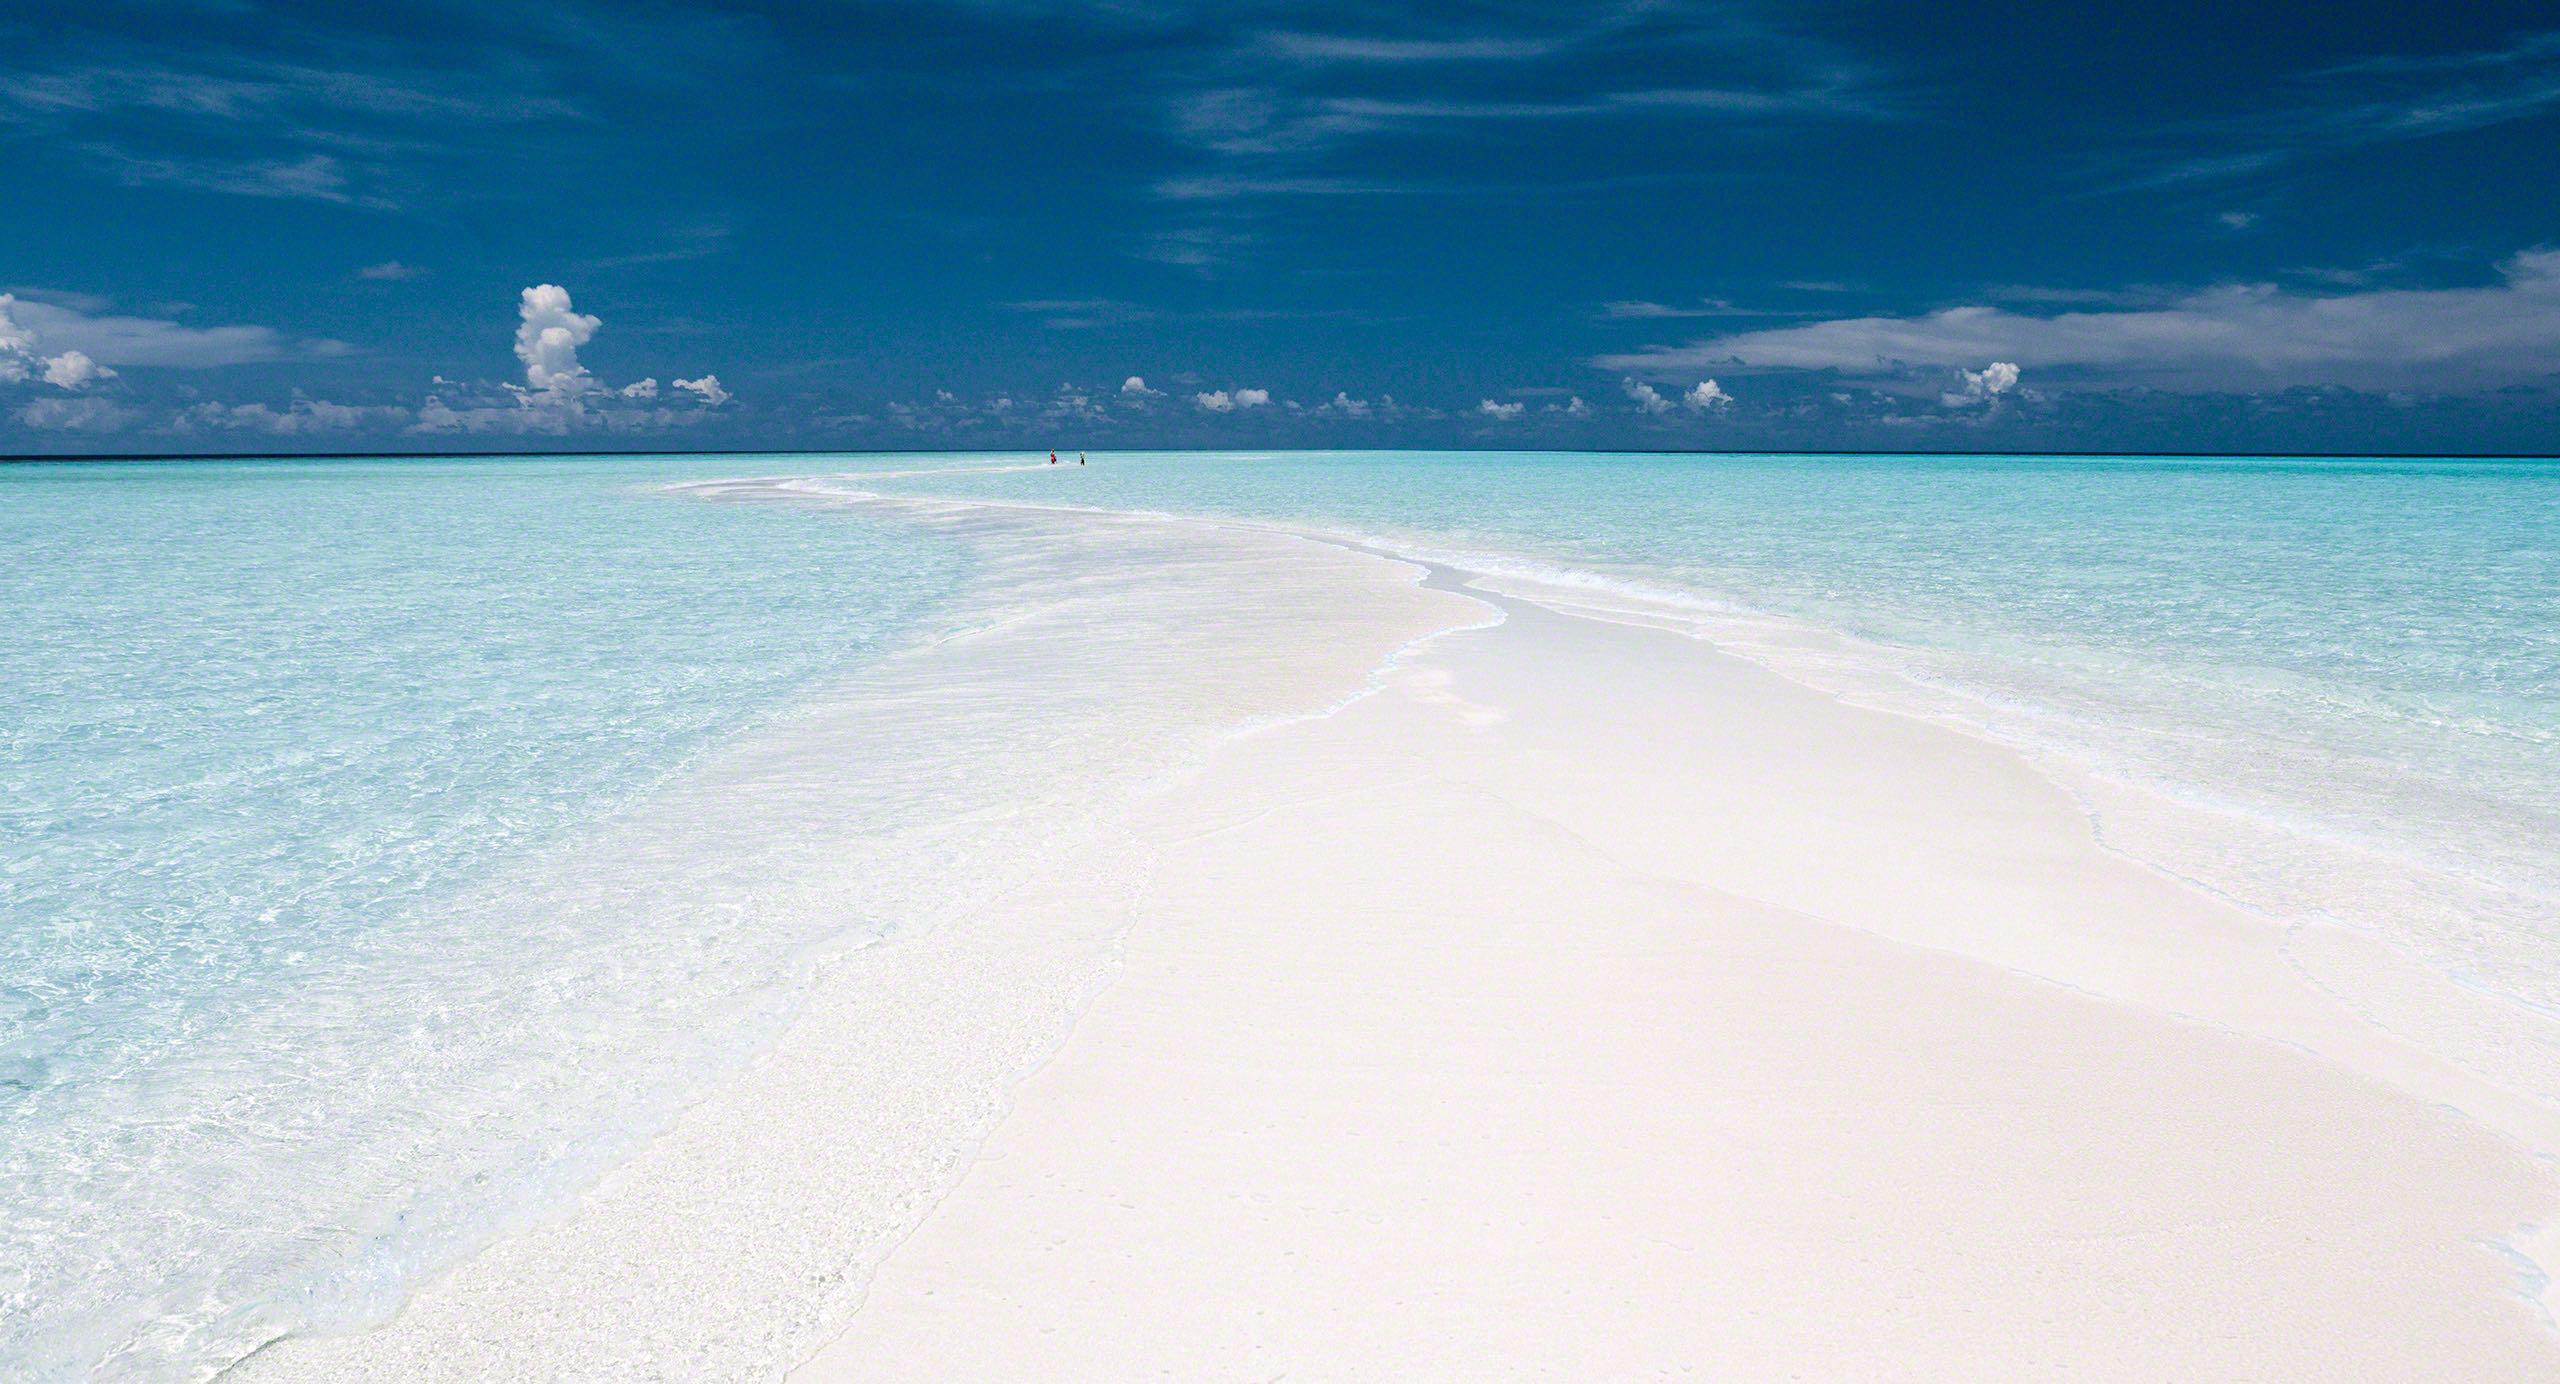 Endlose Sandbank auf Kuramathi Island Malediven.